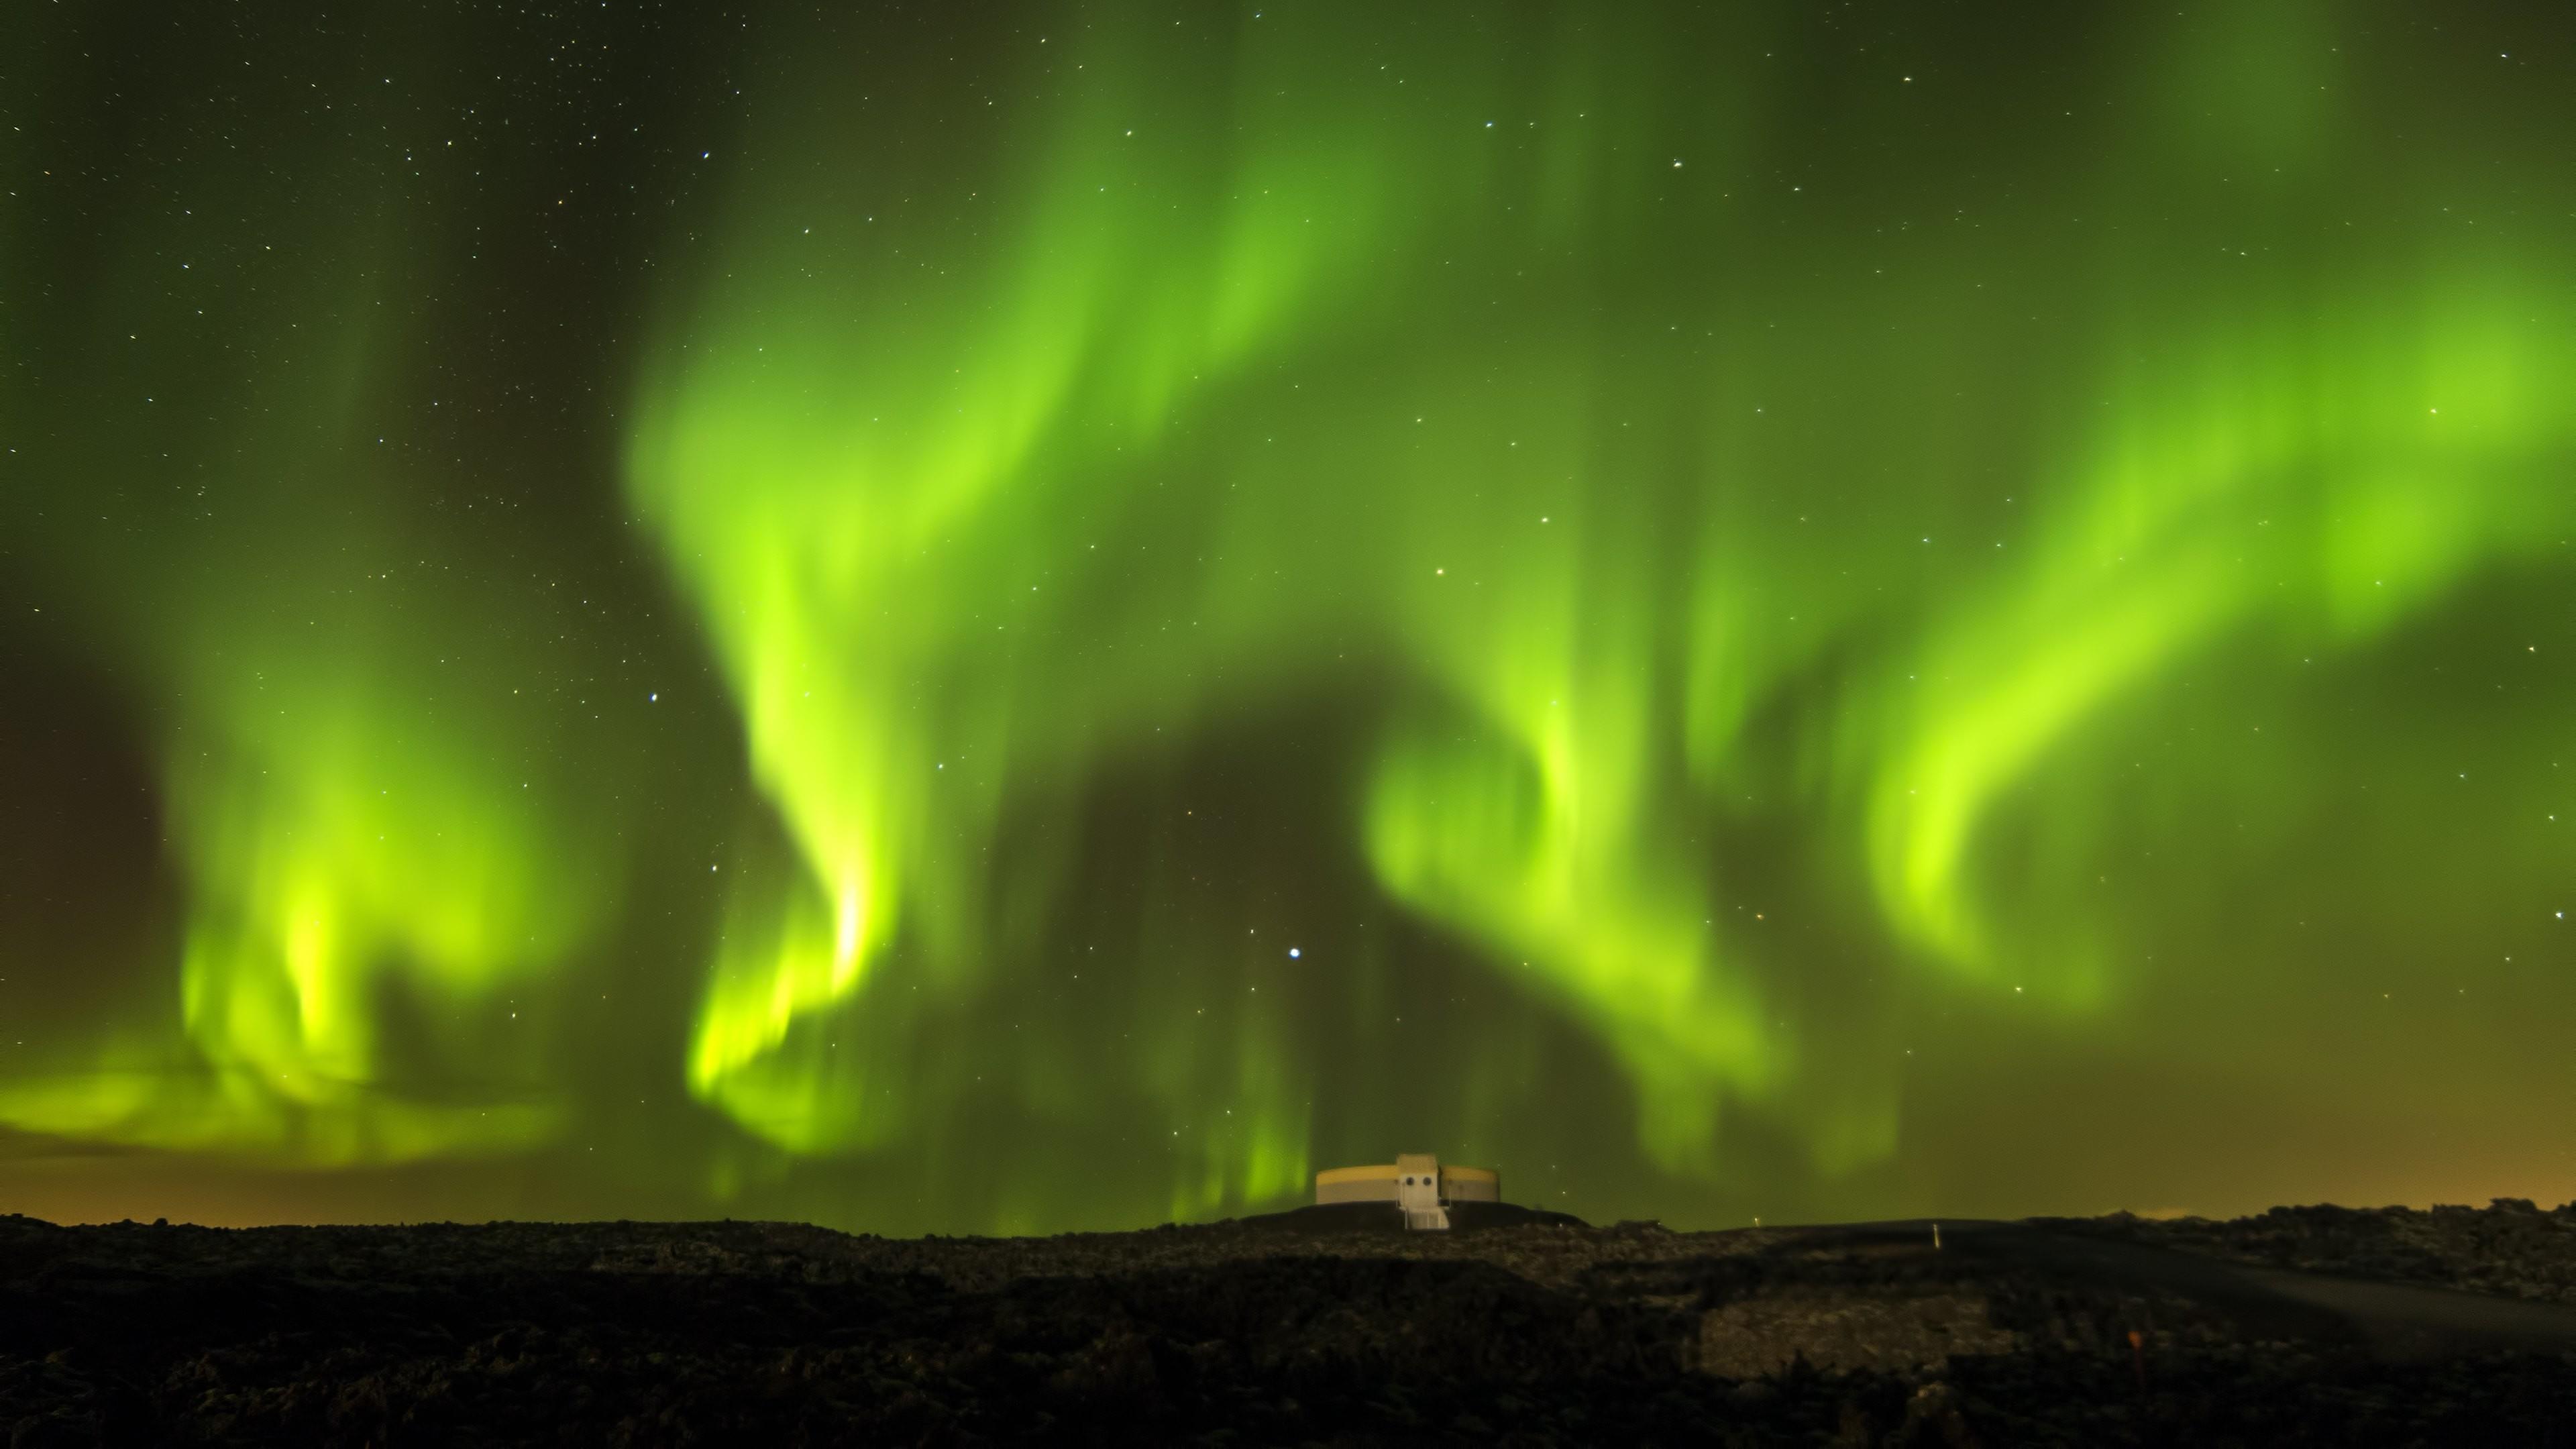 4K HD Wallpaper: Natural Sky. Aurora. Northern Lights